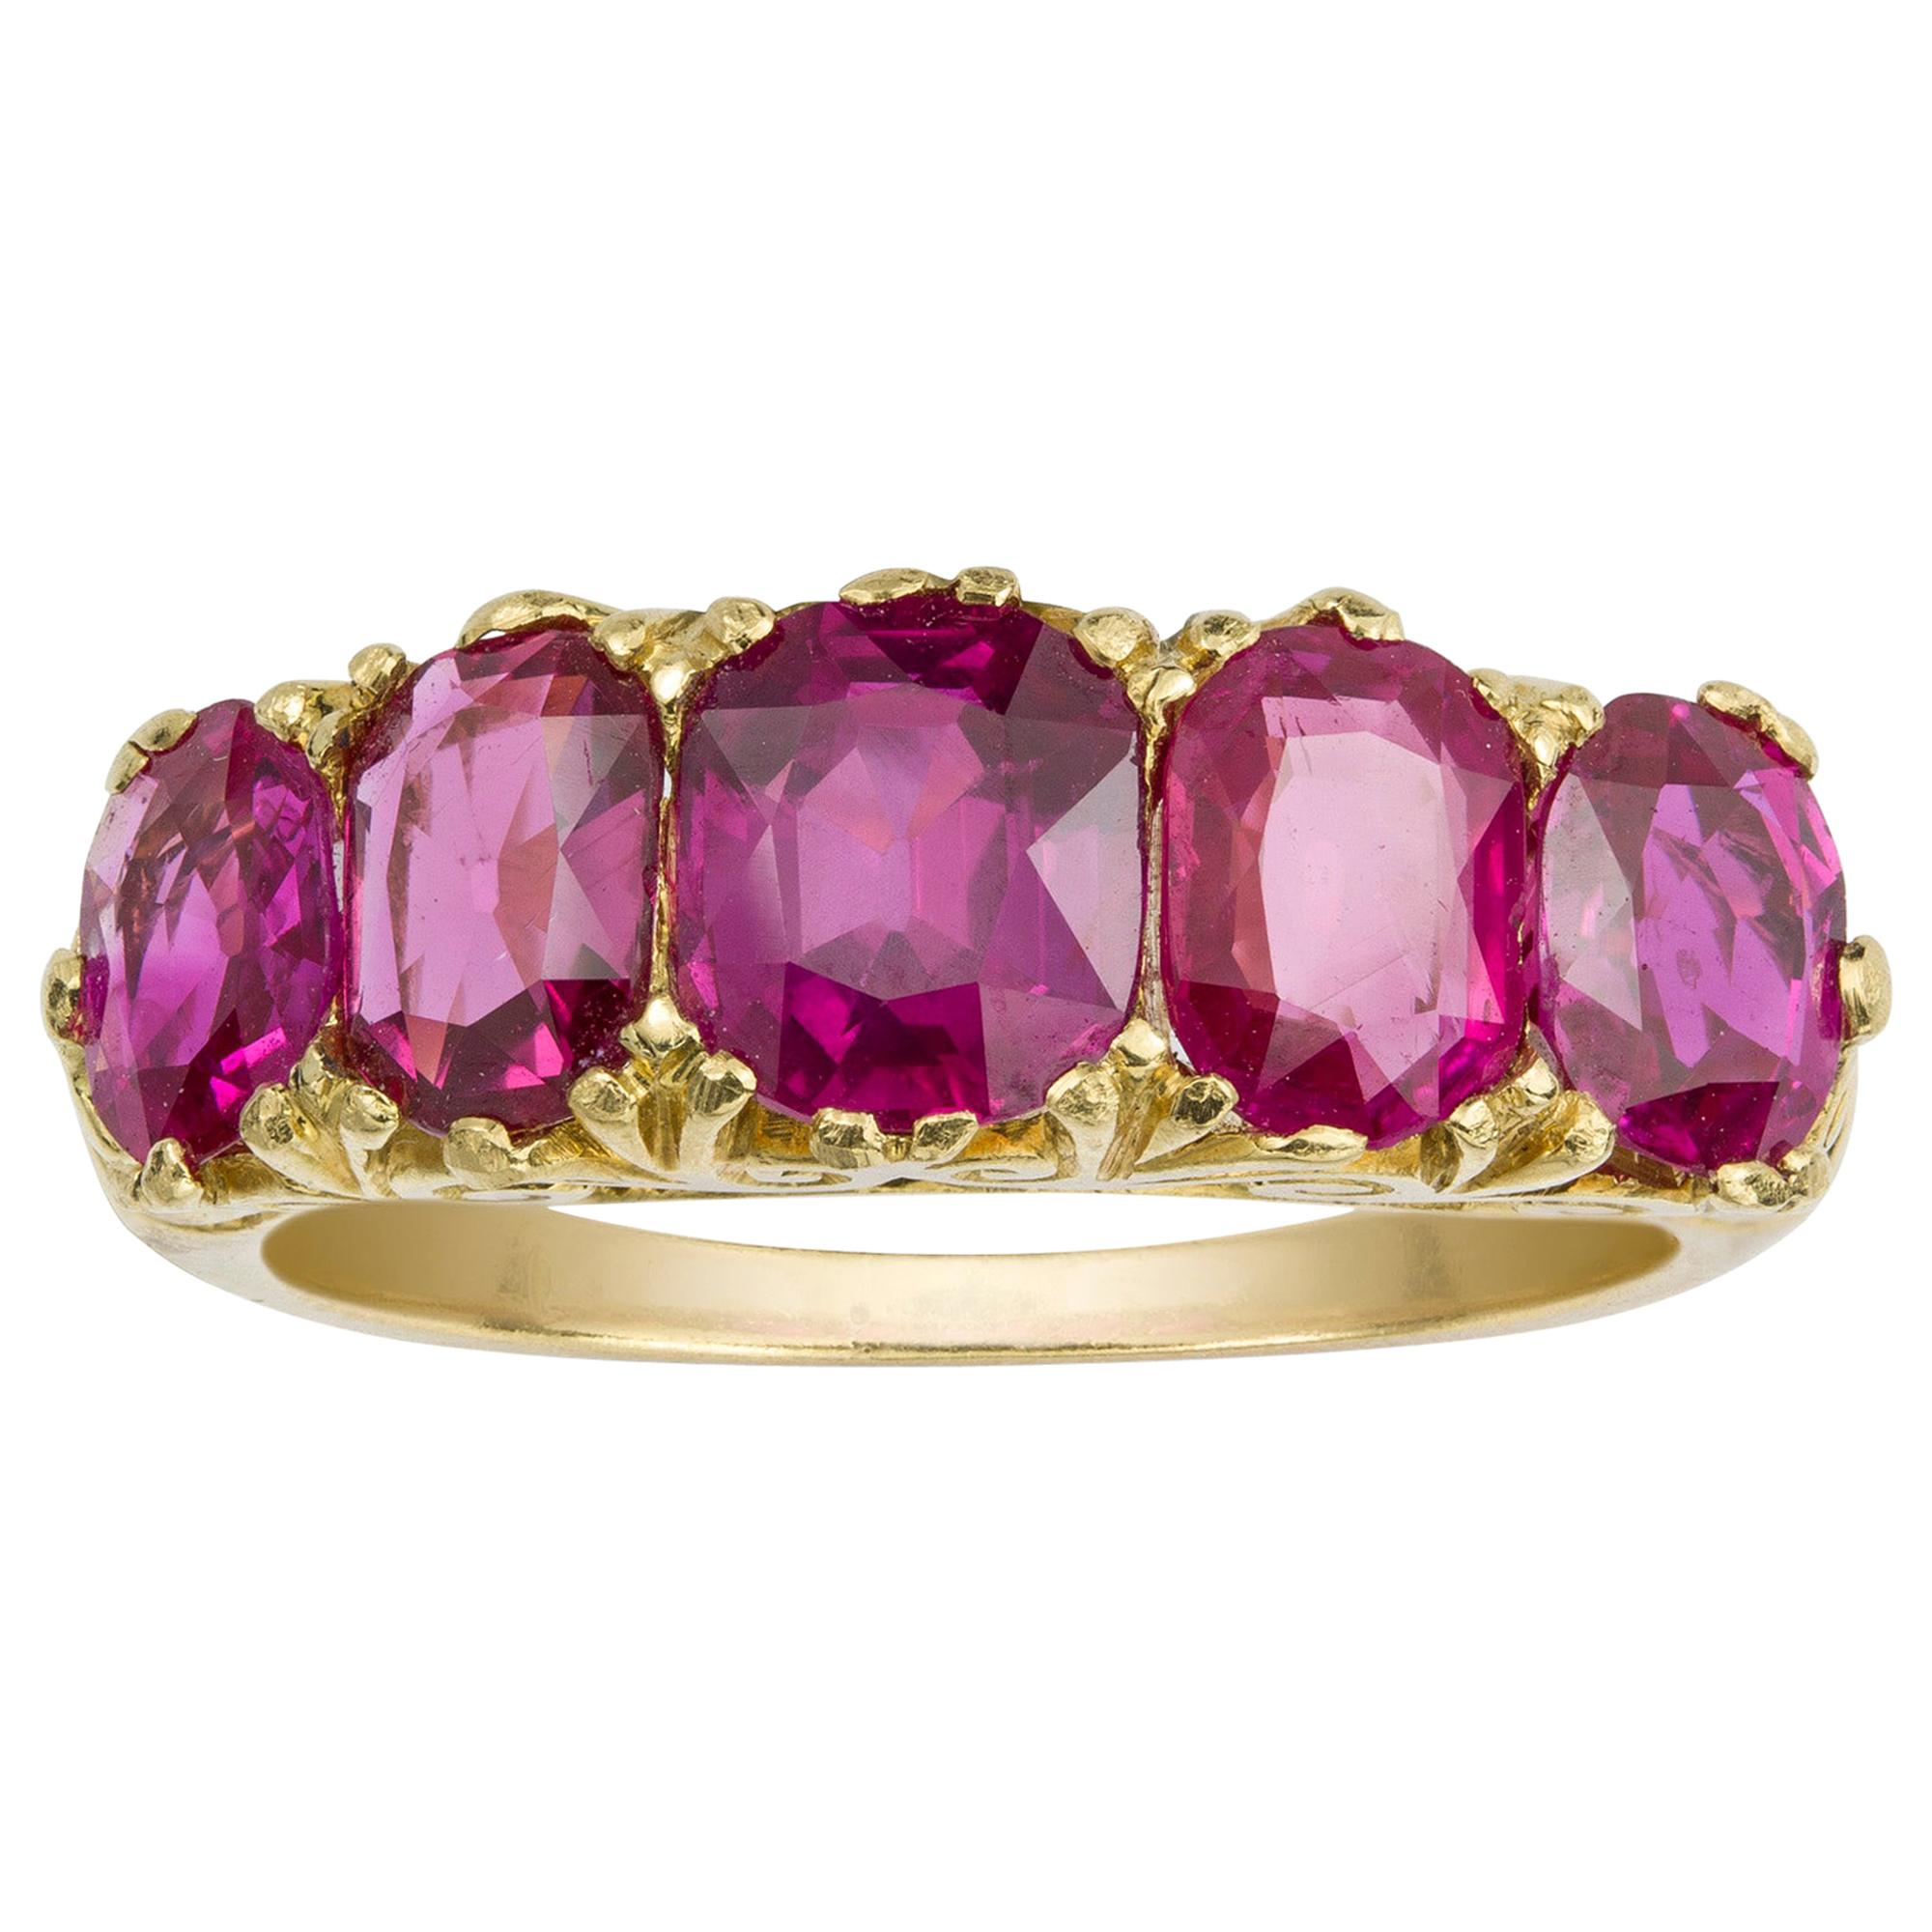 Victorian Five-Stone Burmese Ruby Ring